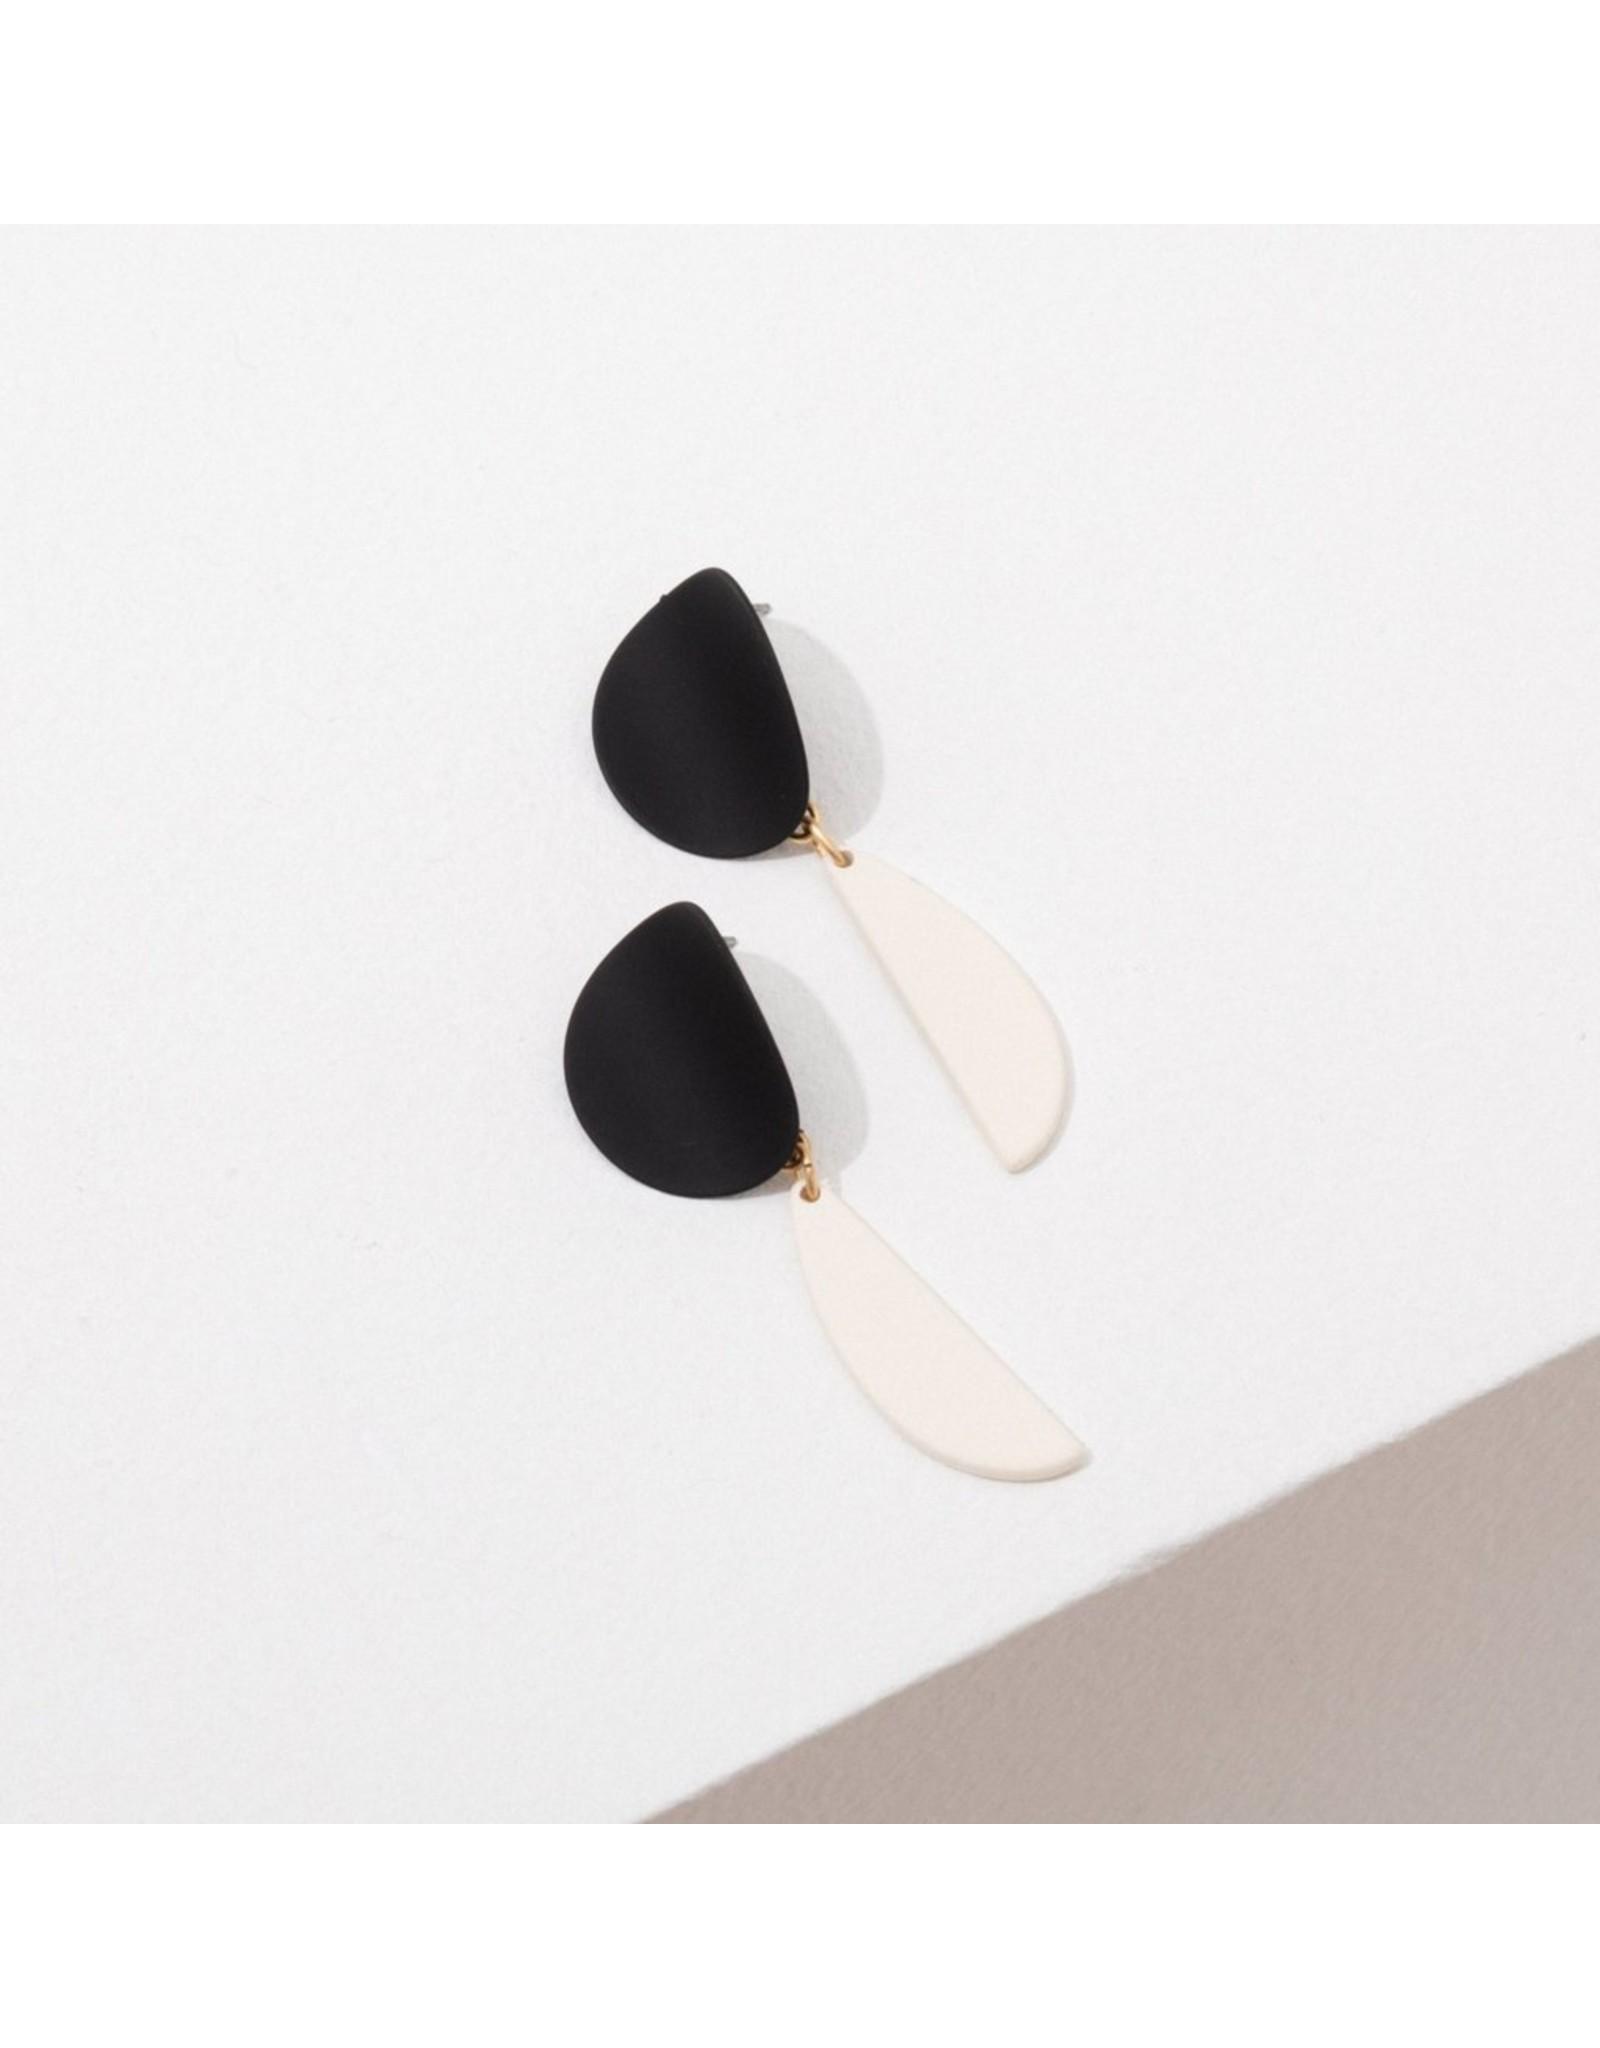 Larissa Loden Yayoi earrings-Black